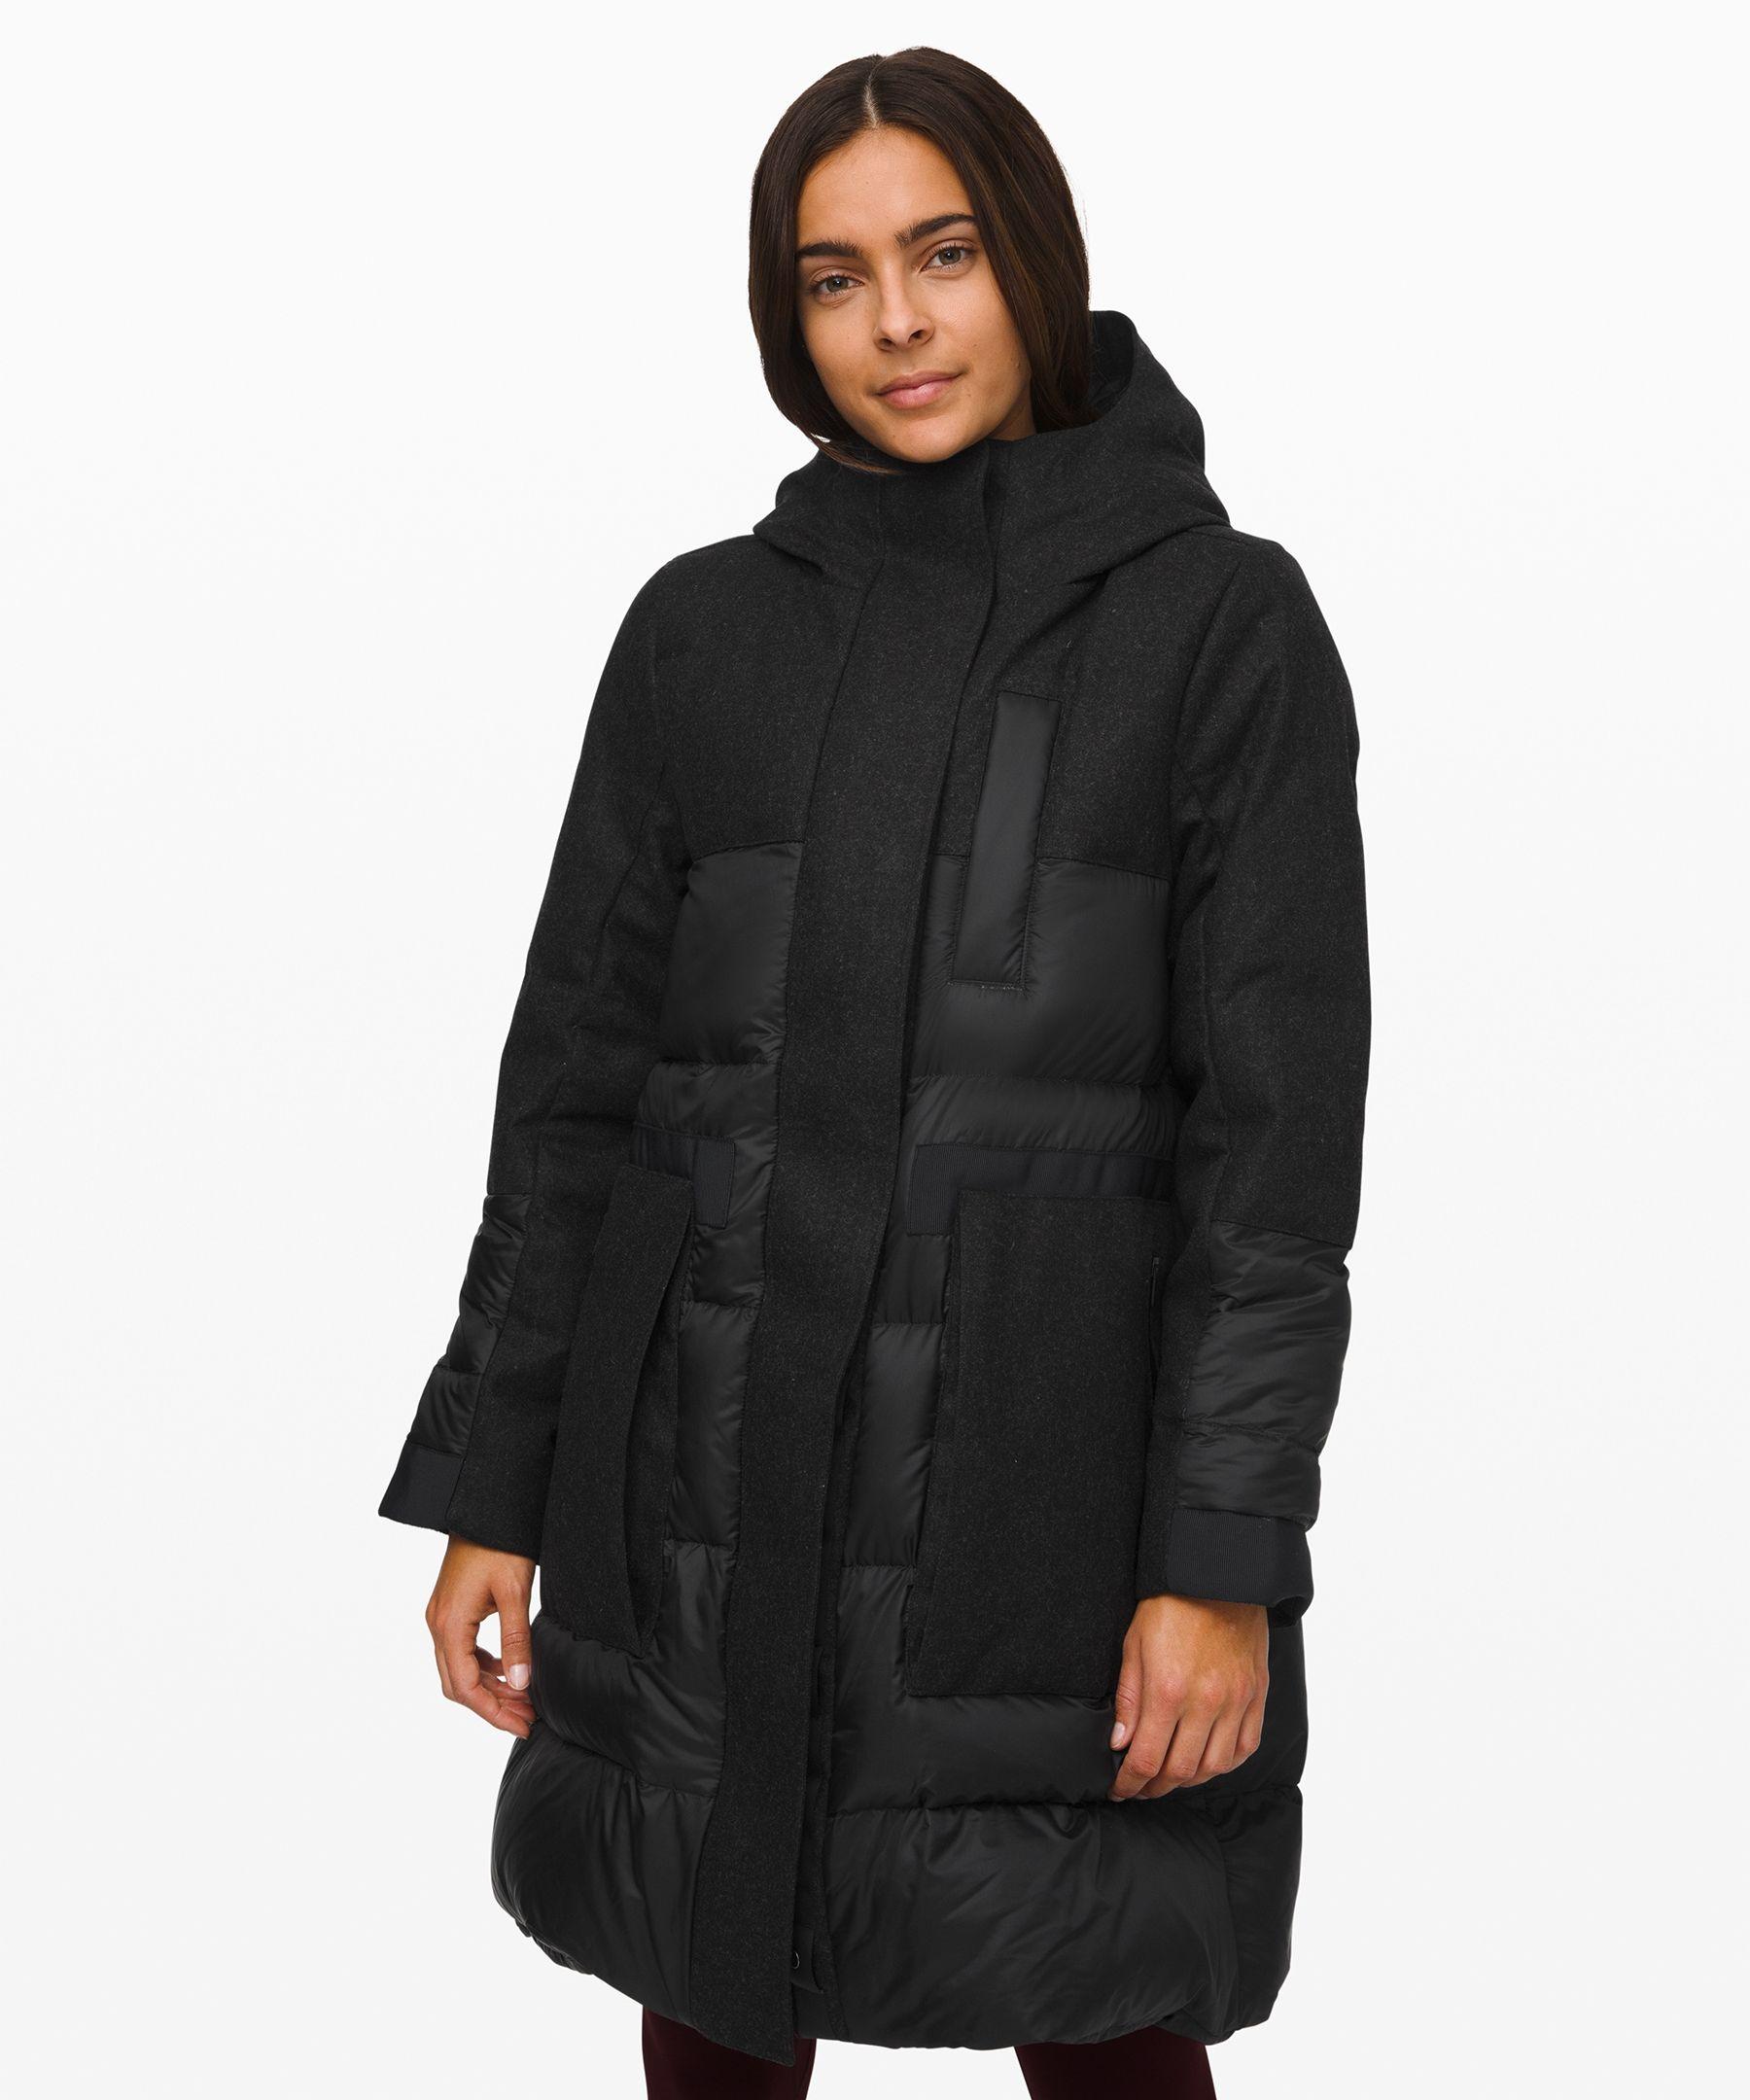 Lululemon Winter Chill Wool Parka Lululemon Cloth Coats For Women Parka Womens Parka [ 2160 x 1800 Pixel ]